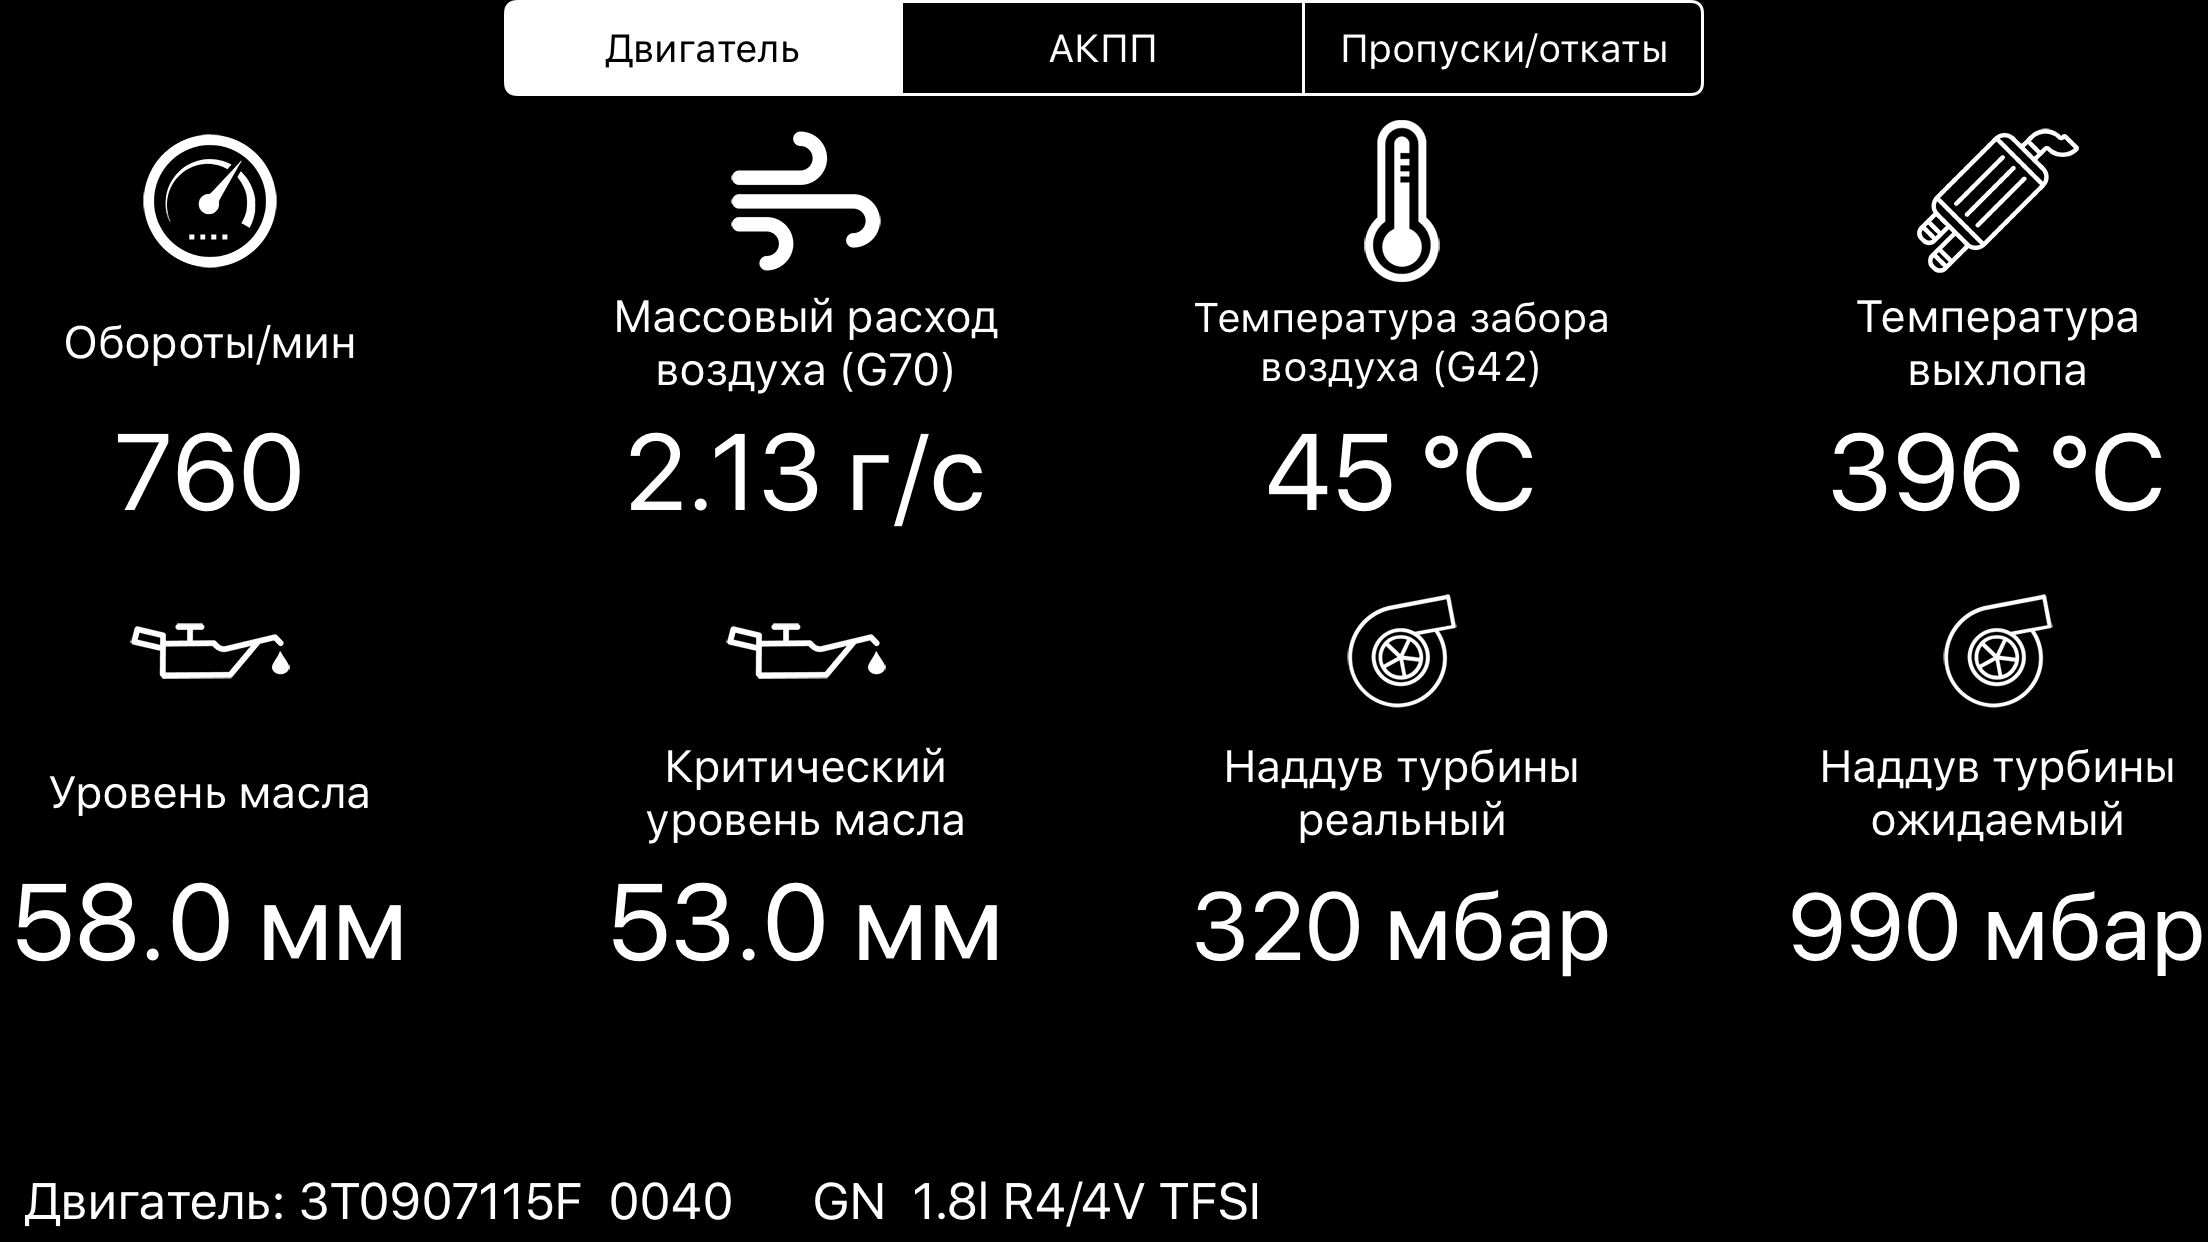 VAG Virtual Cockpit - экран с данными от двигателя по протоколу VW TP 2.0